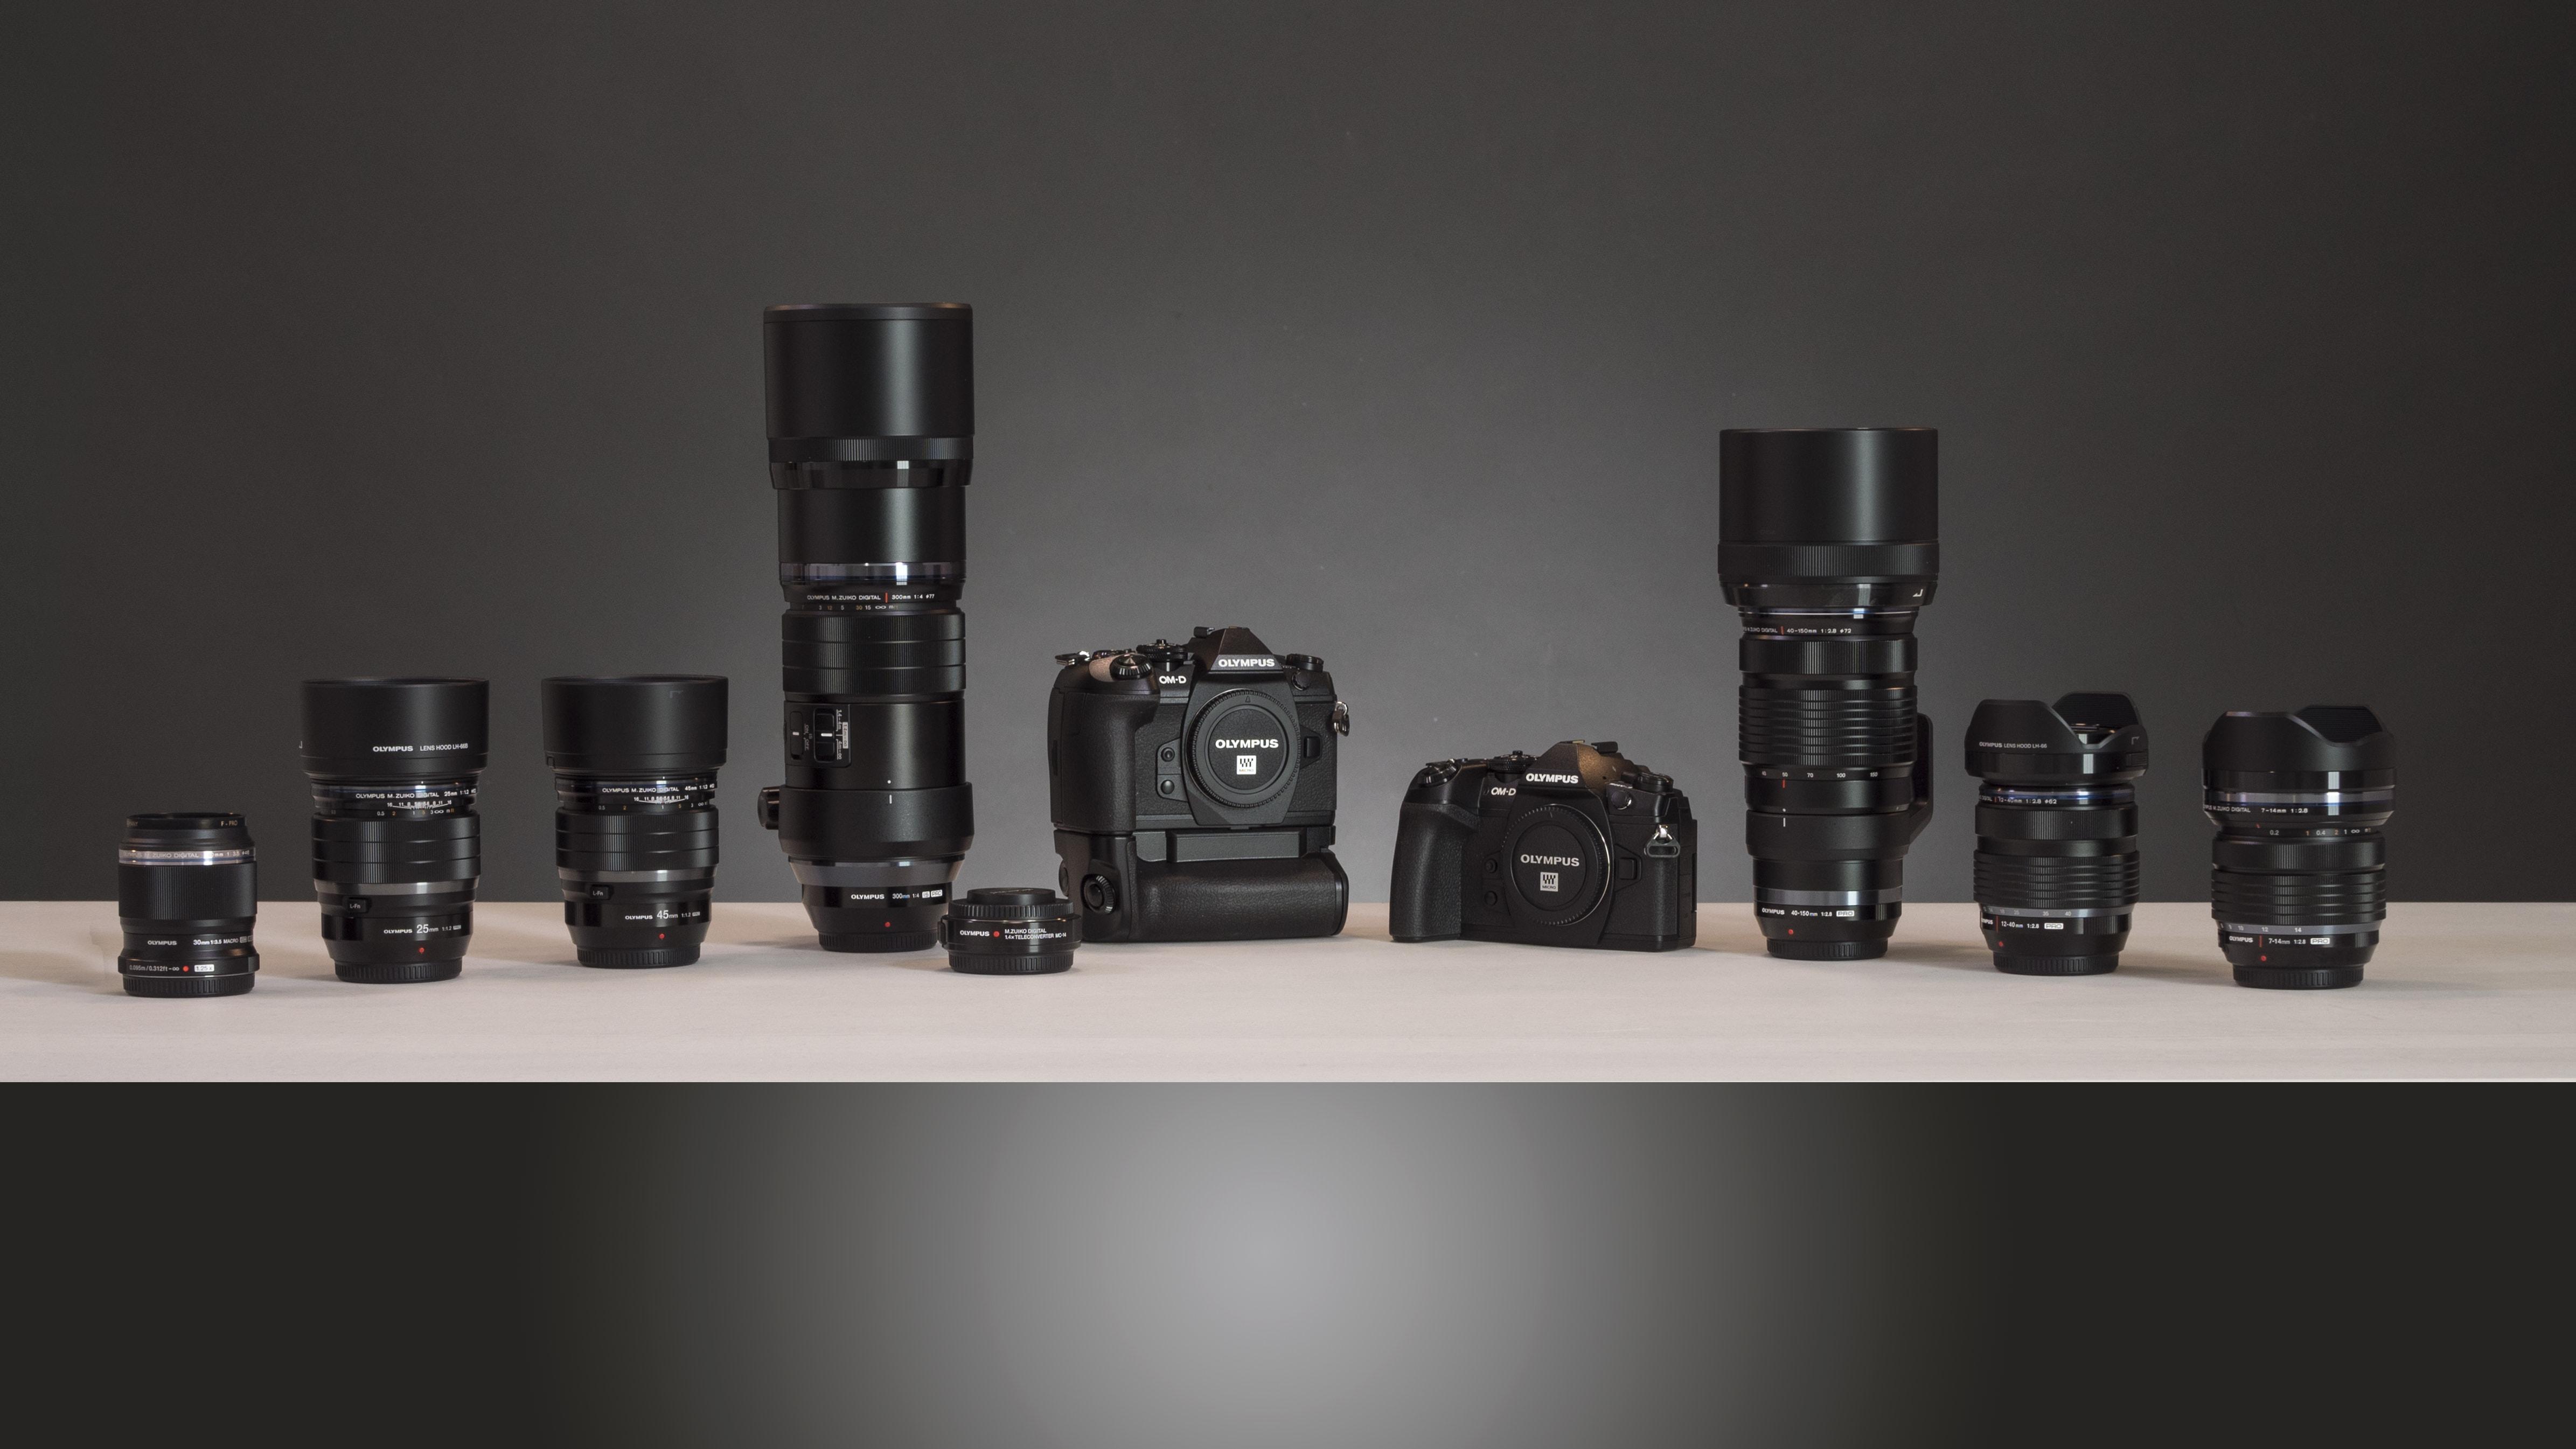 My Olympus Camera Kit